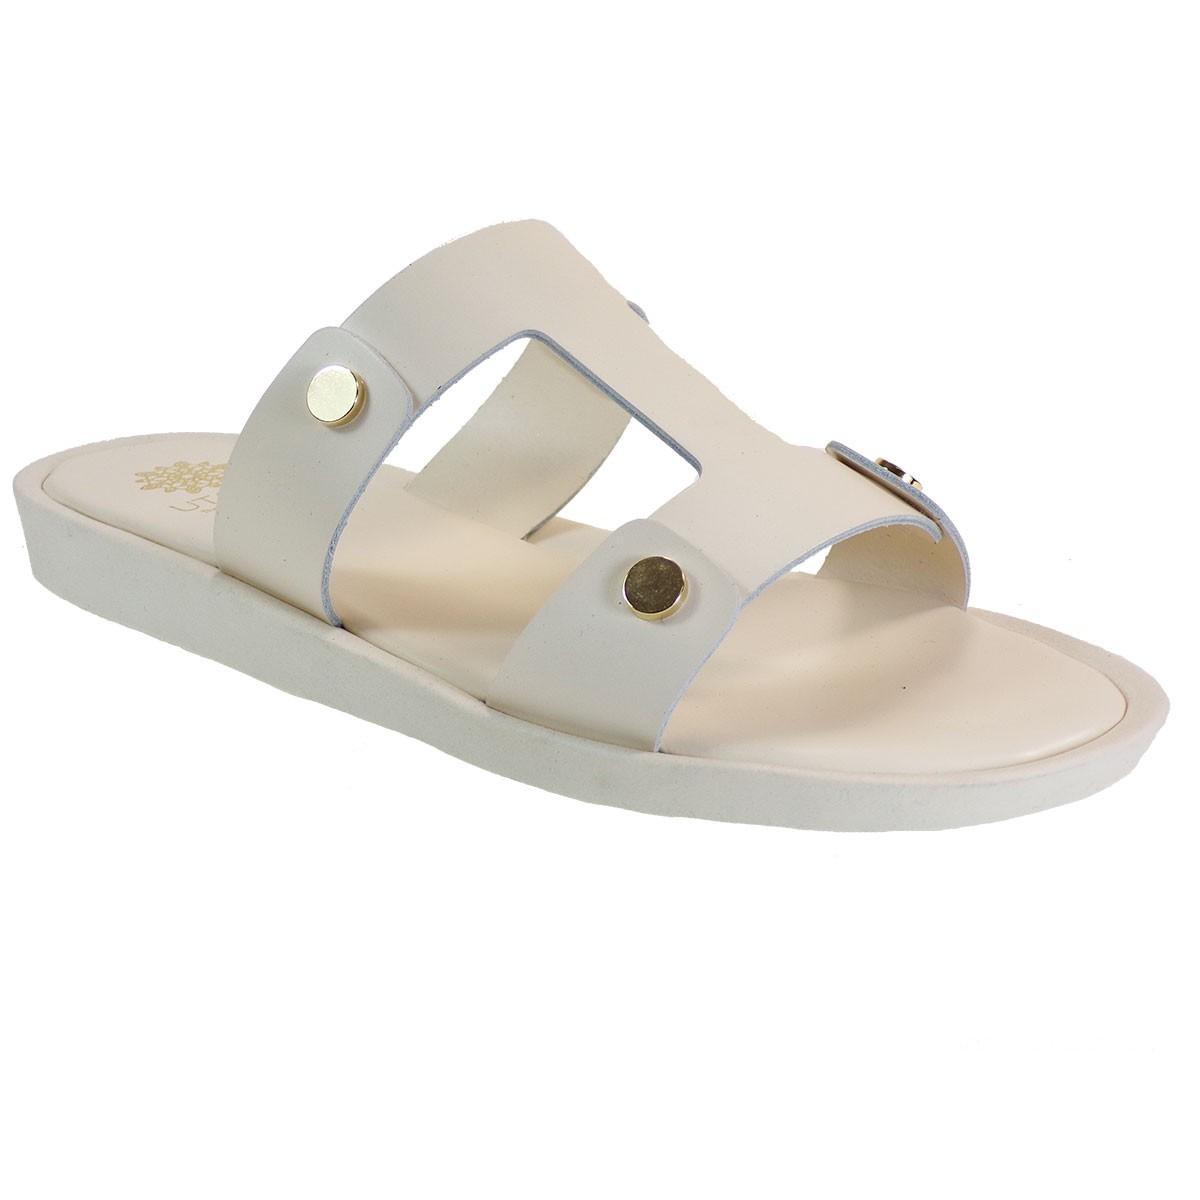 UTOPIA Γυναικεία Παπούτσια Παντόφλες U3-006 Λευκό Δέρμα